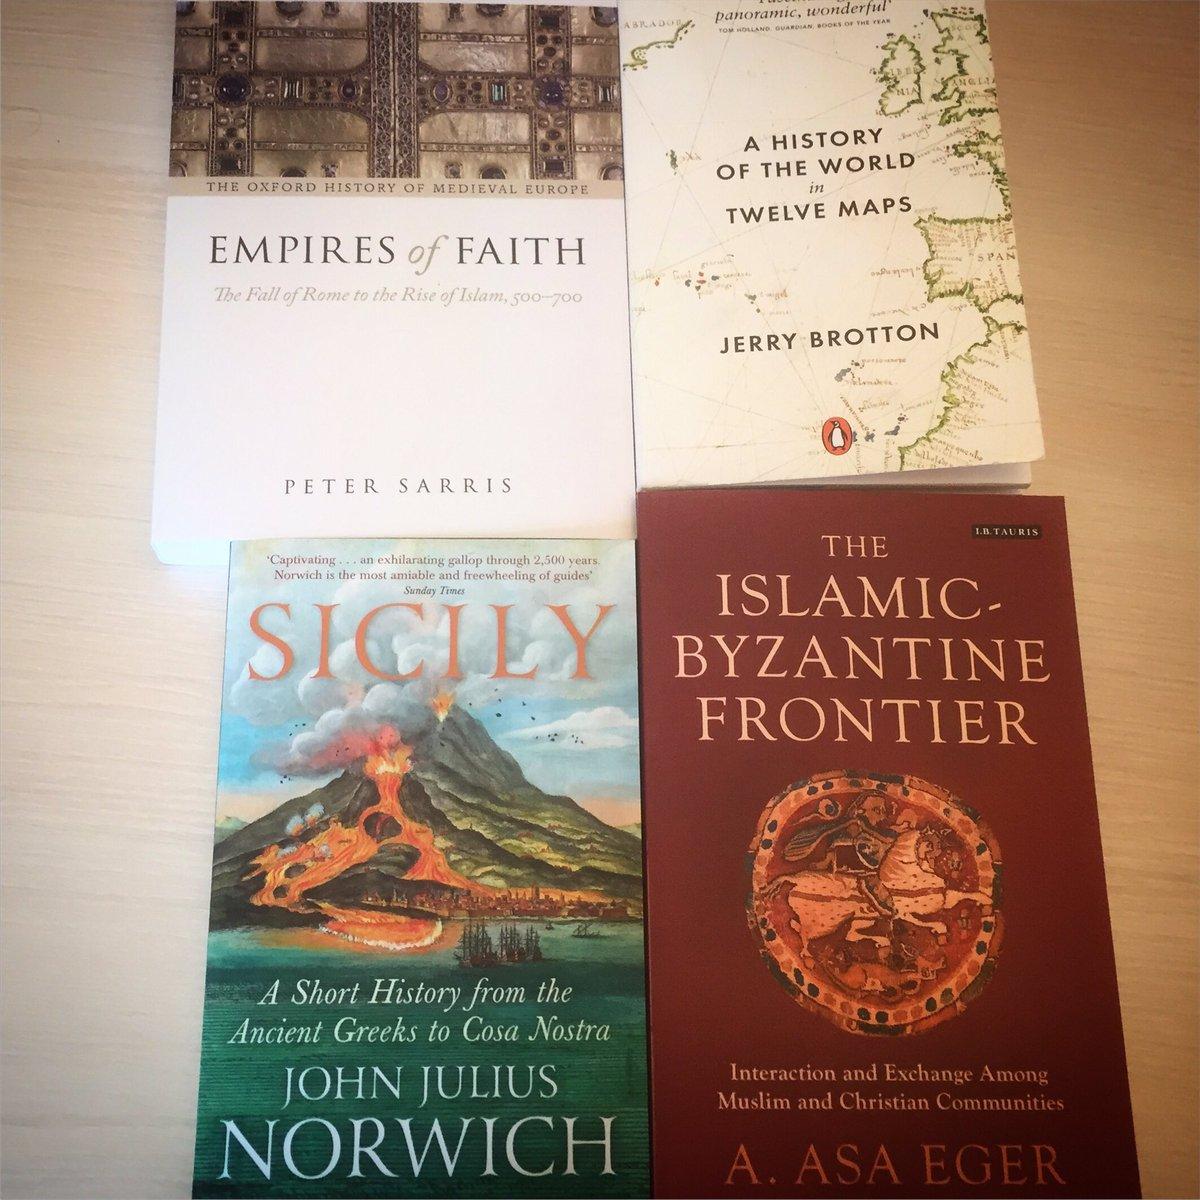 The four #books that will accompany me in the next three months. #volersibene #history #sicily #islam #Byzantium #politics #academics #libripic.twitter.com/qY1iA43eic